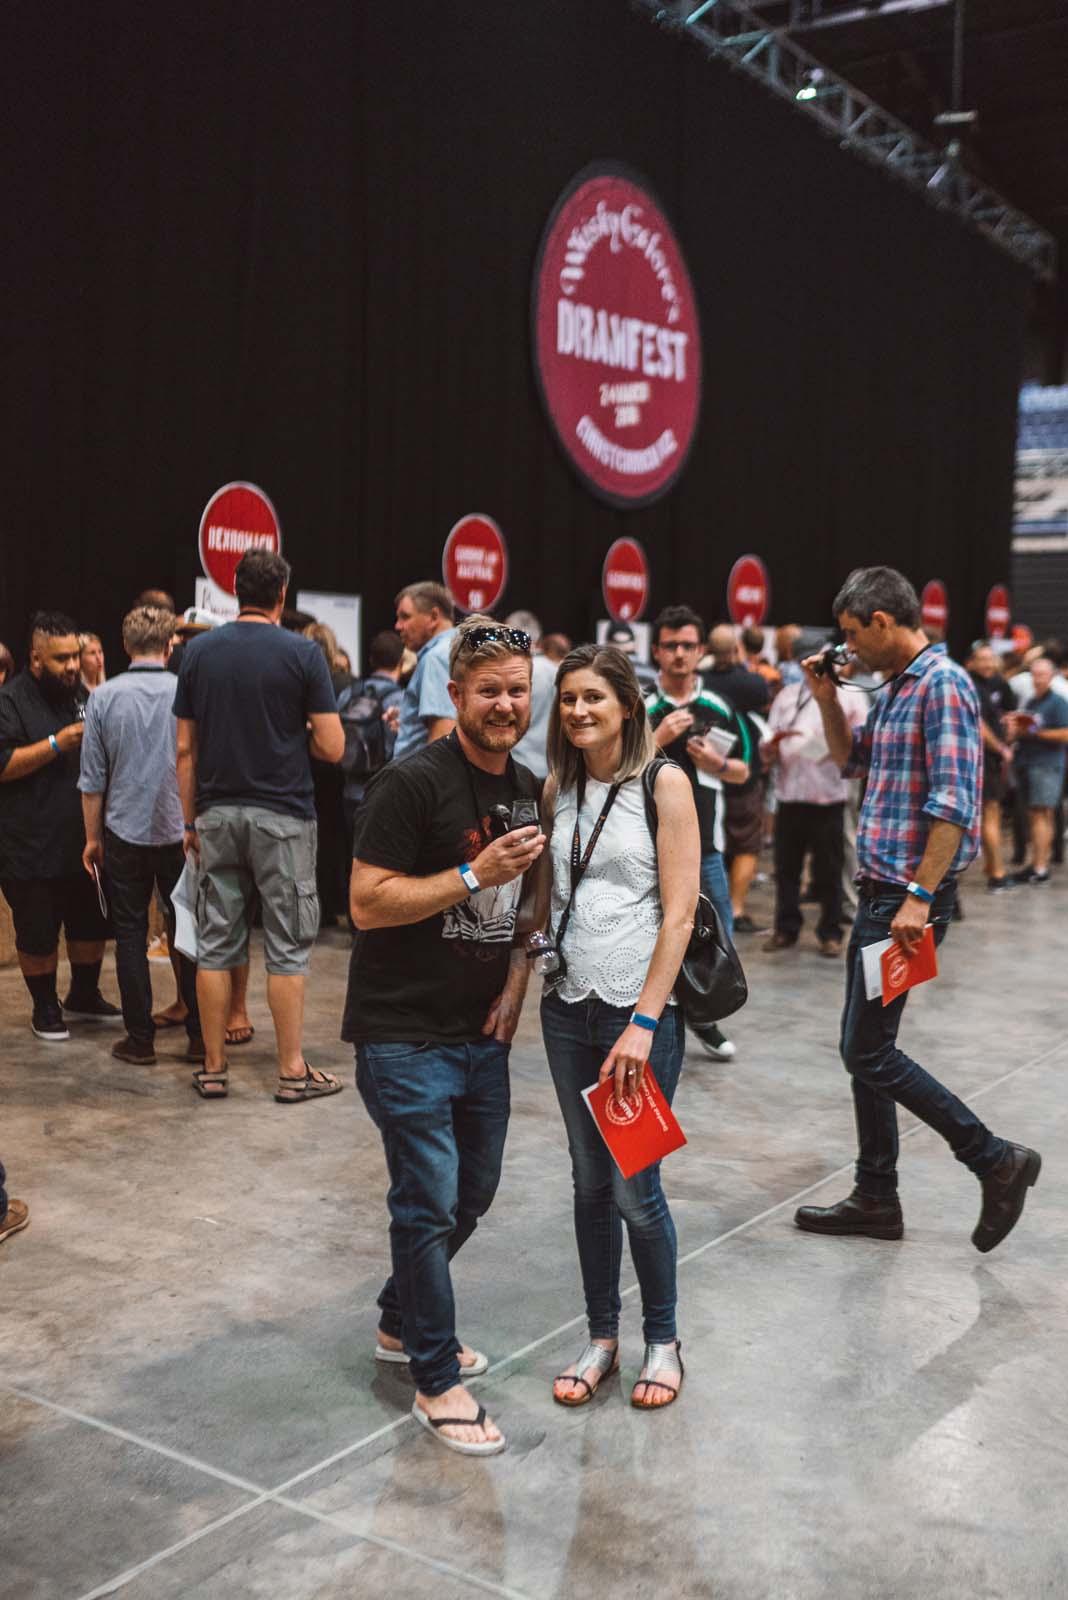 Dramfest 2018 for Whisky Galore-268.jpg